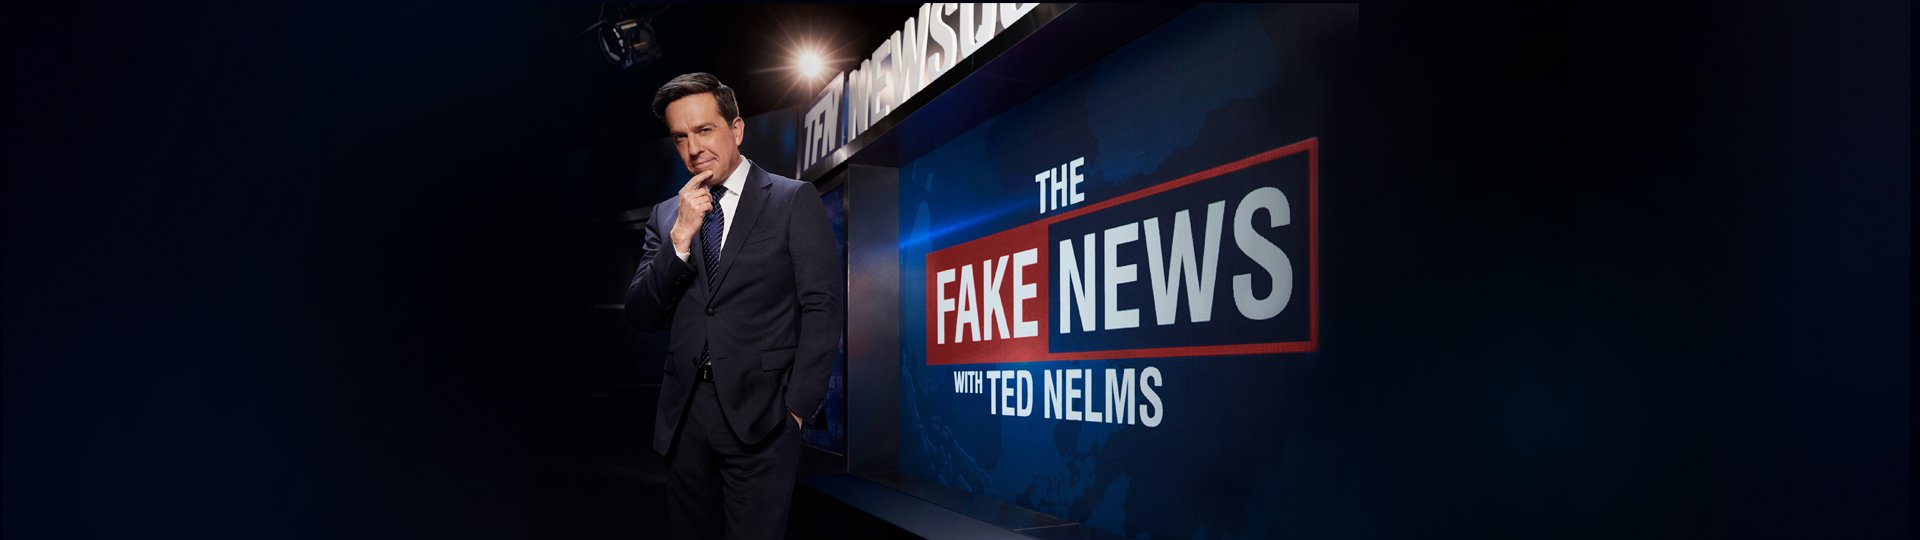 The Fake News